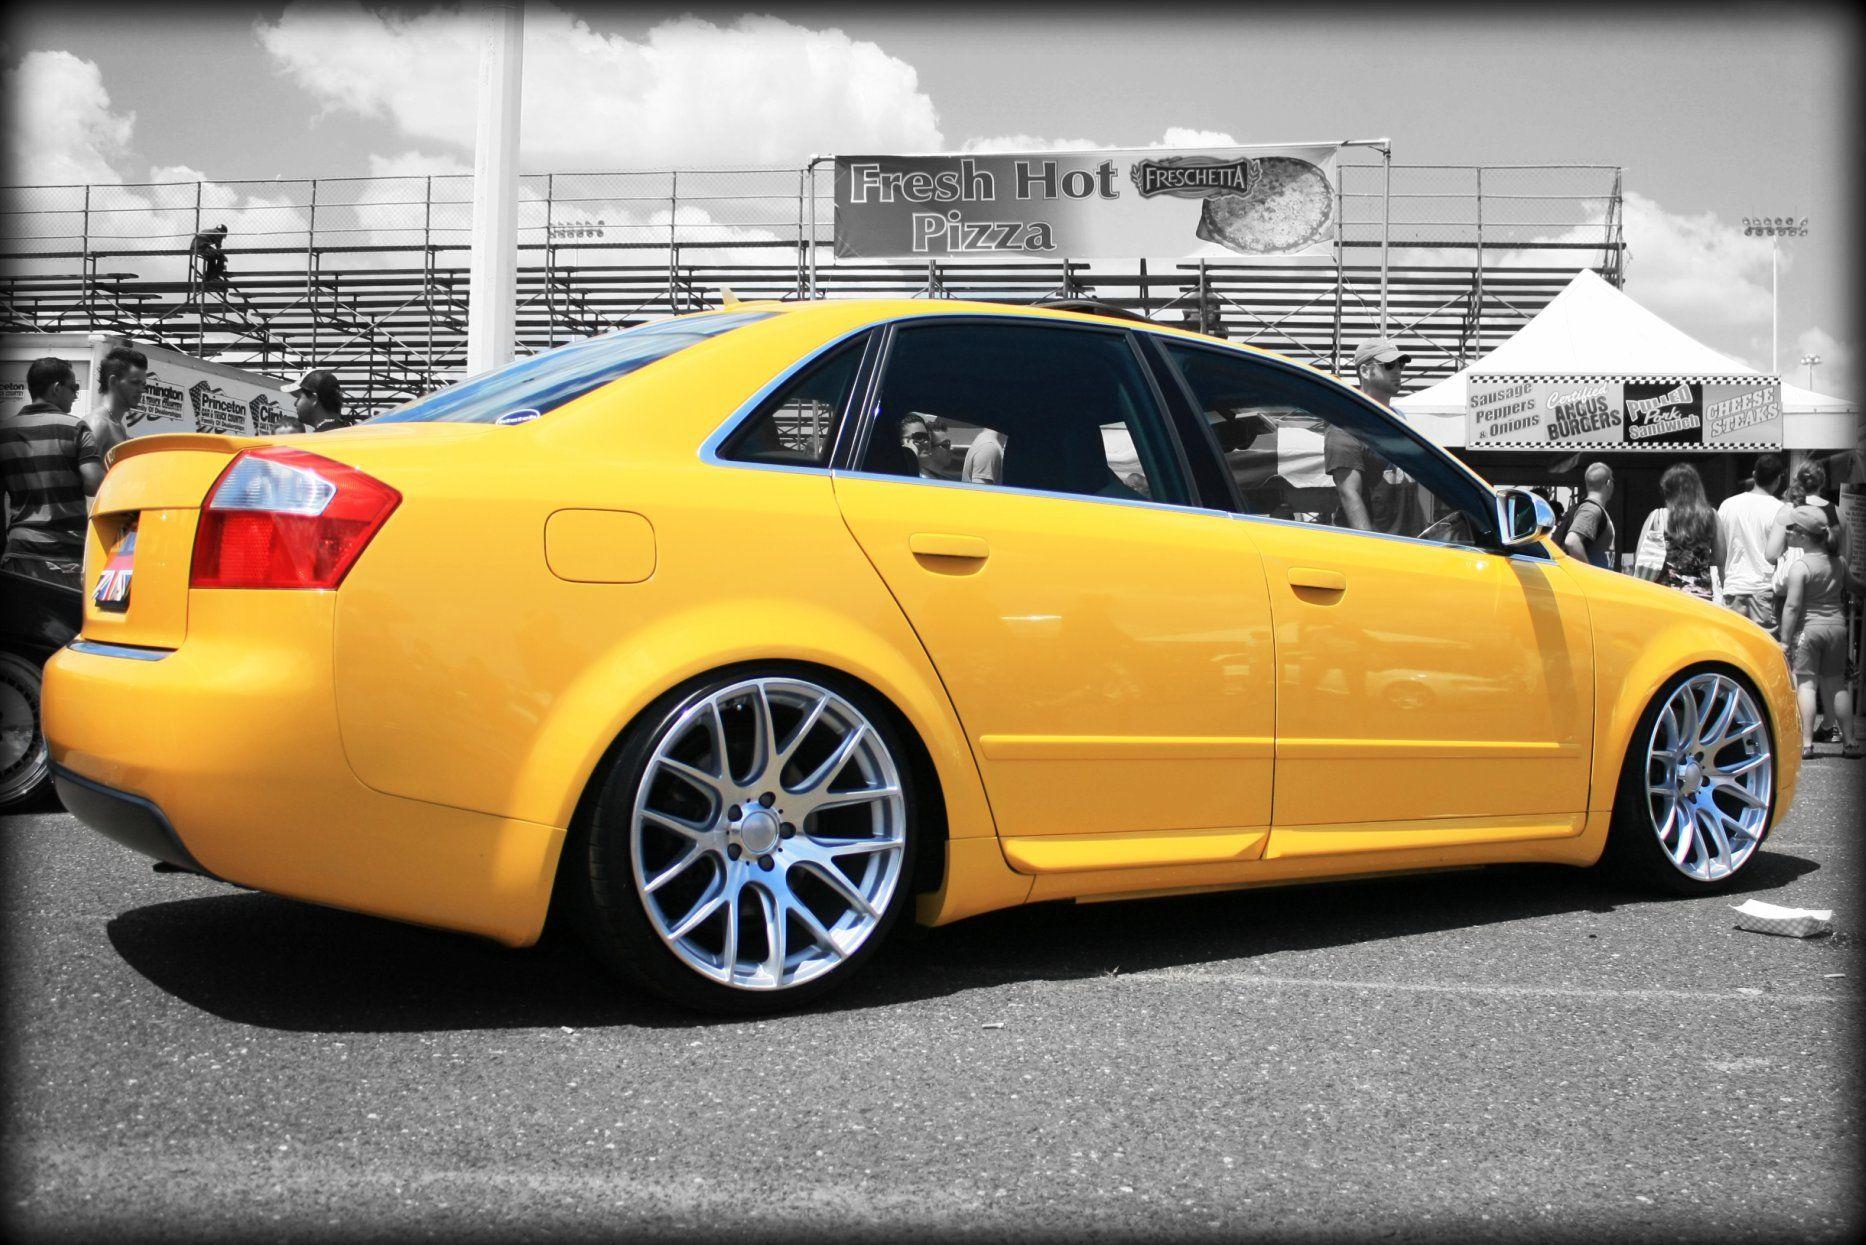 stanced   A4 B6   Pinterest   Audi, Audi a4 and Cars